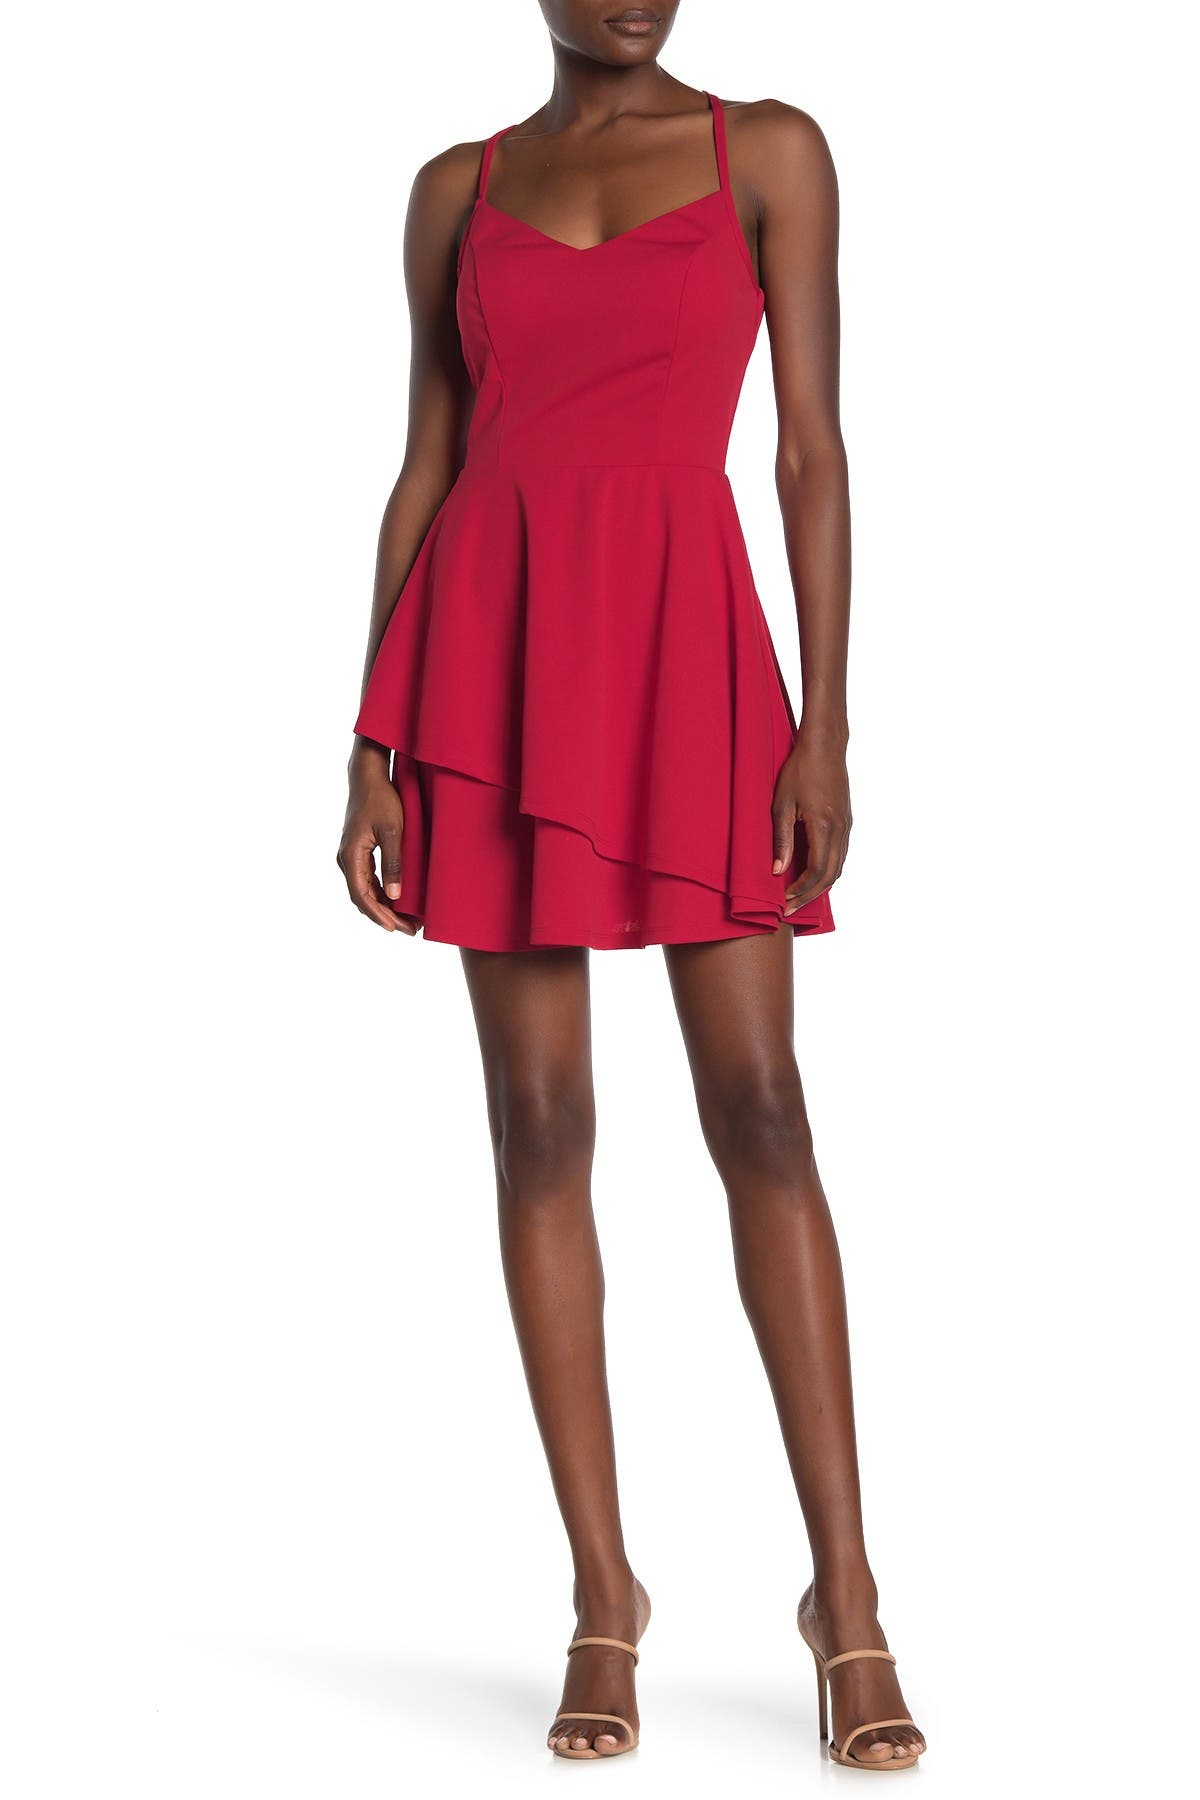 Image of ROW A Lace Back Mini Dress